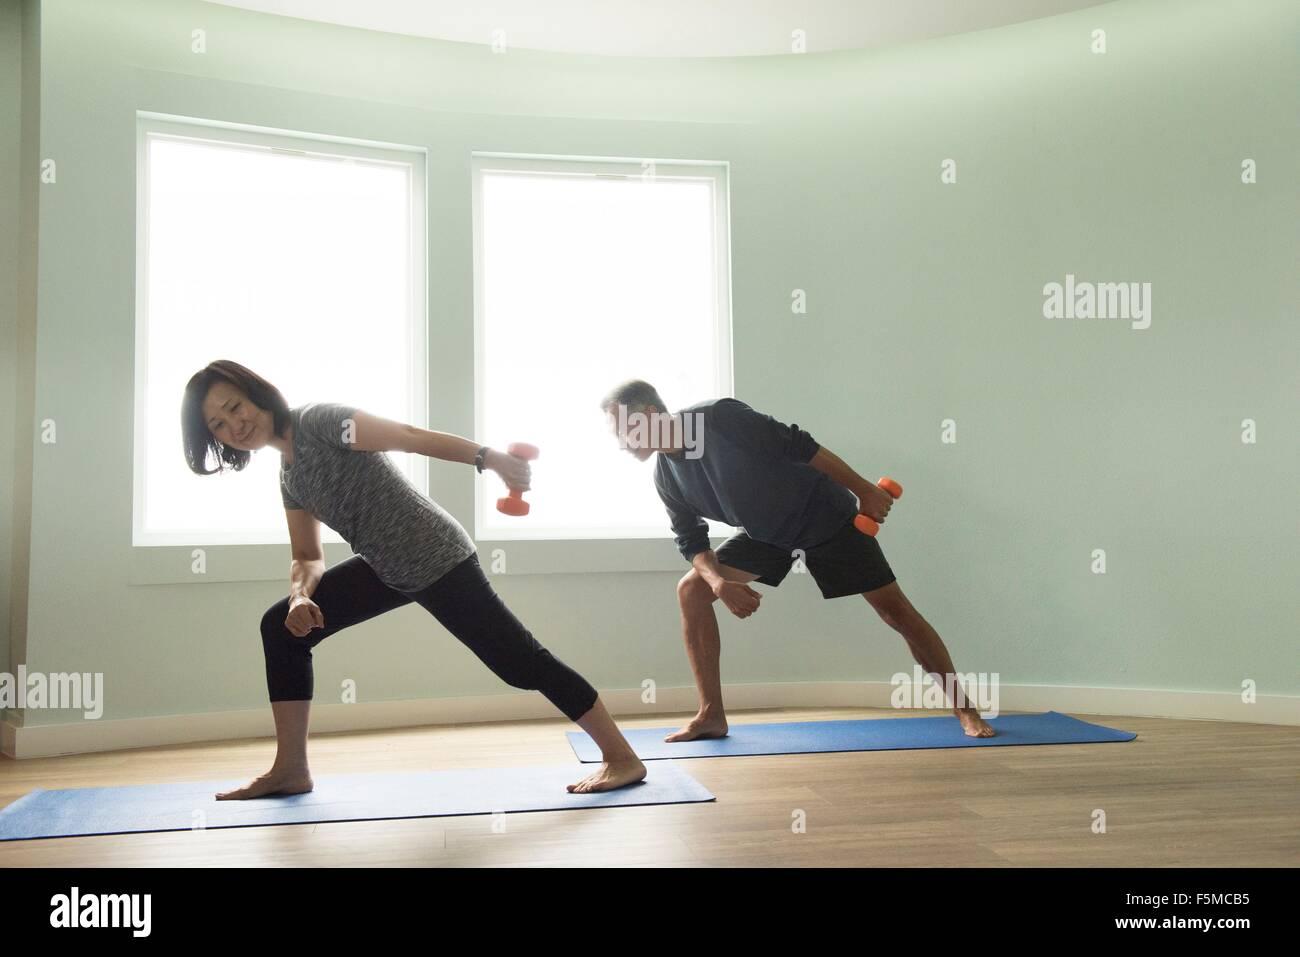 Mature couple on yoga mats exercising using dumbbells - Stock Image